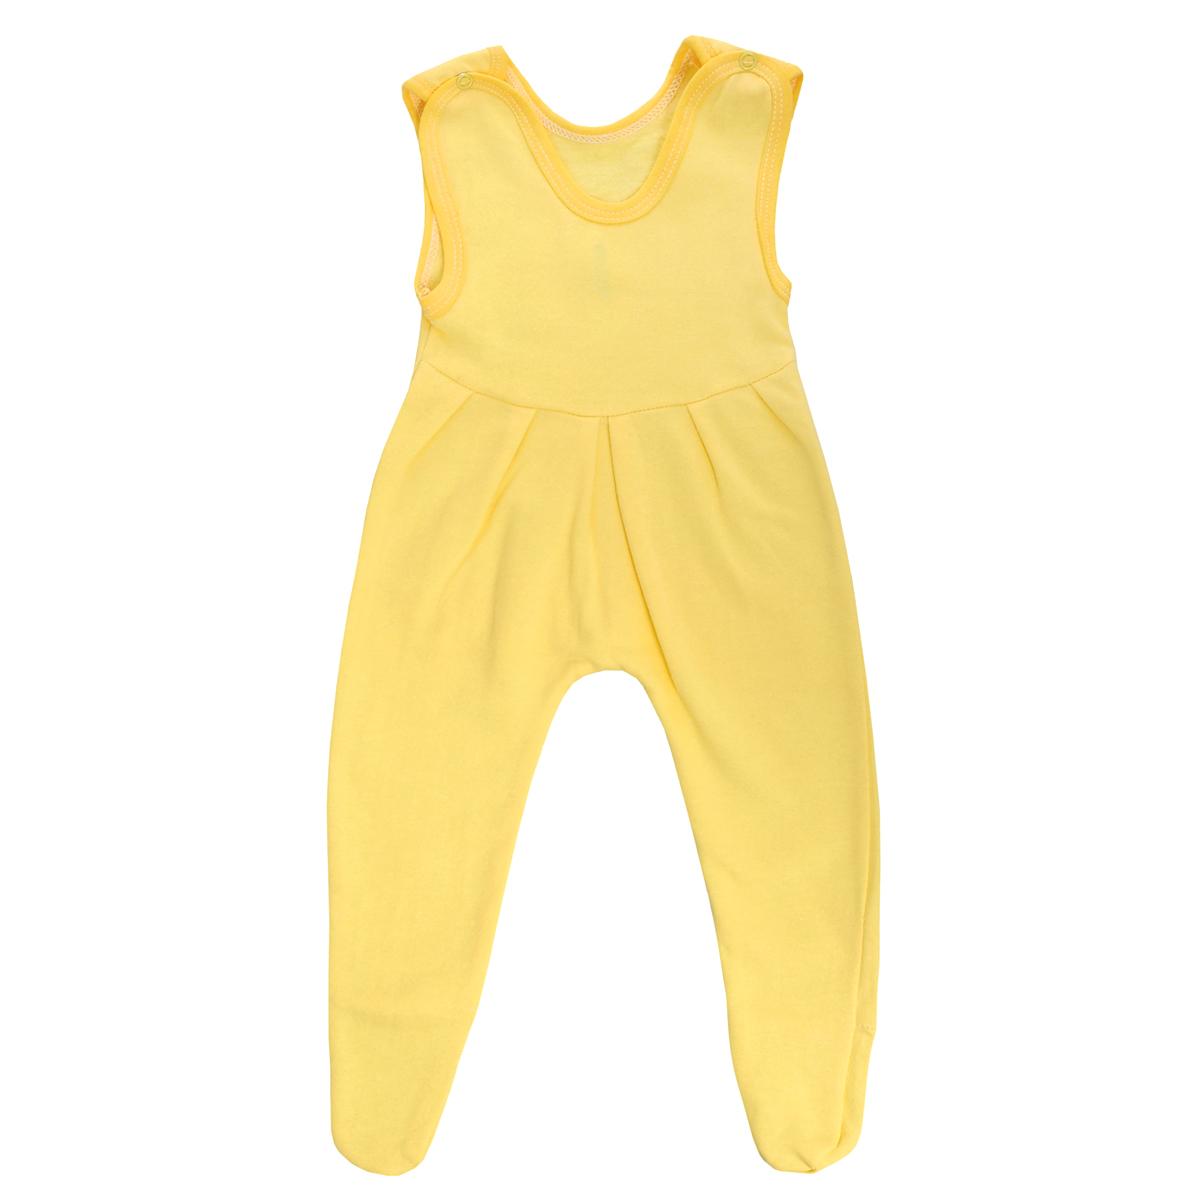 Ползунки с грудкой Трон-плюс, цвет: желтый. 5221. Размер 80, 12 месяцев холодильник side by side samsung rs552nrua1j